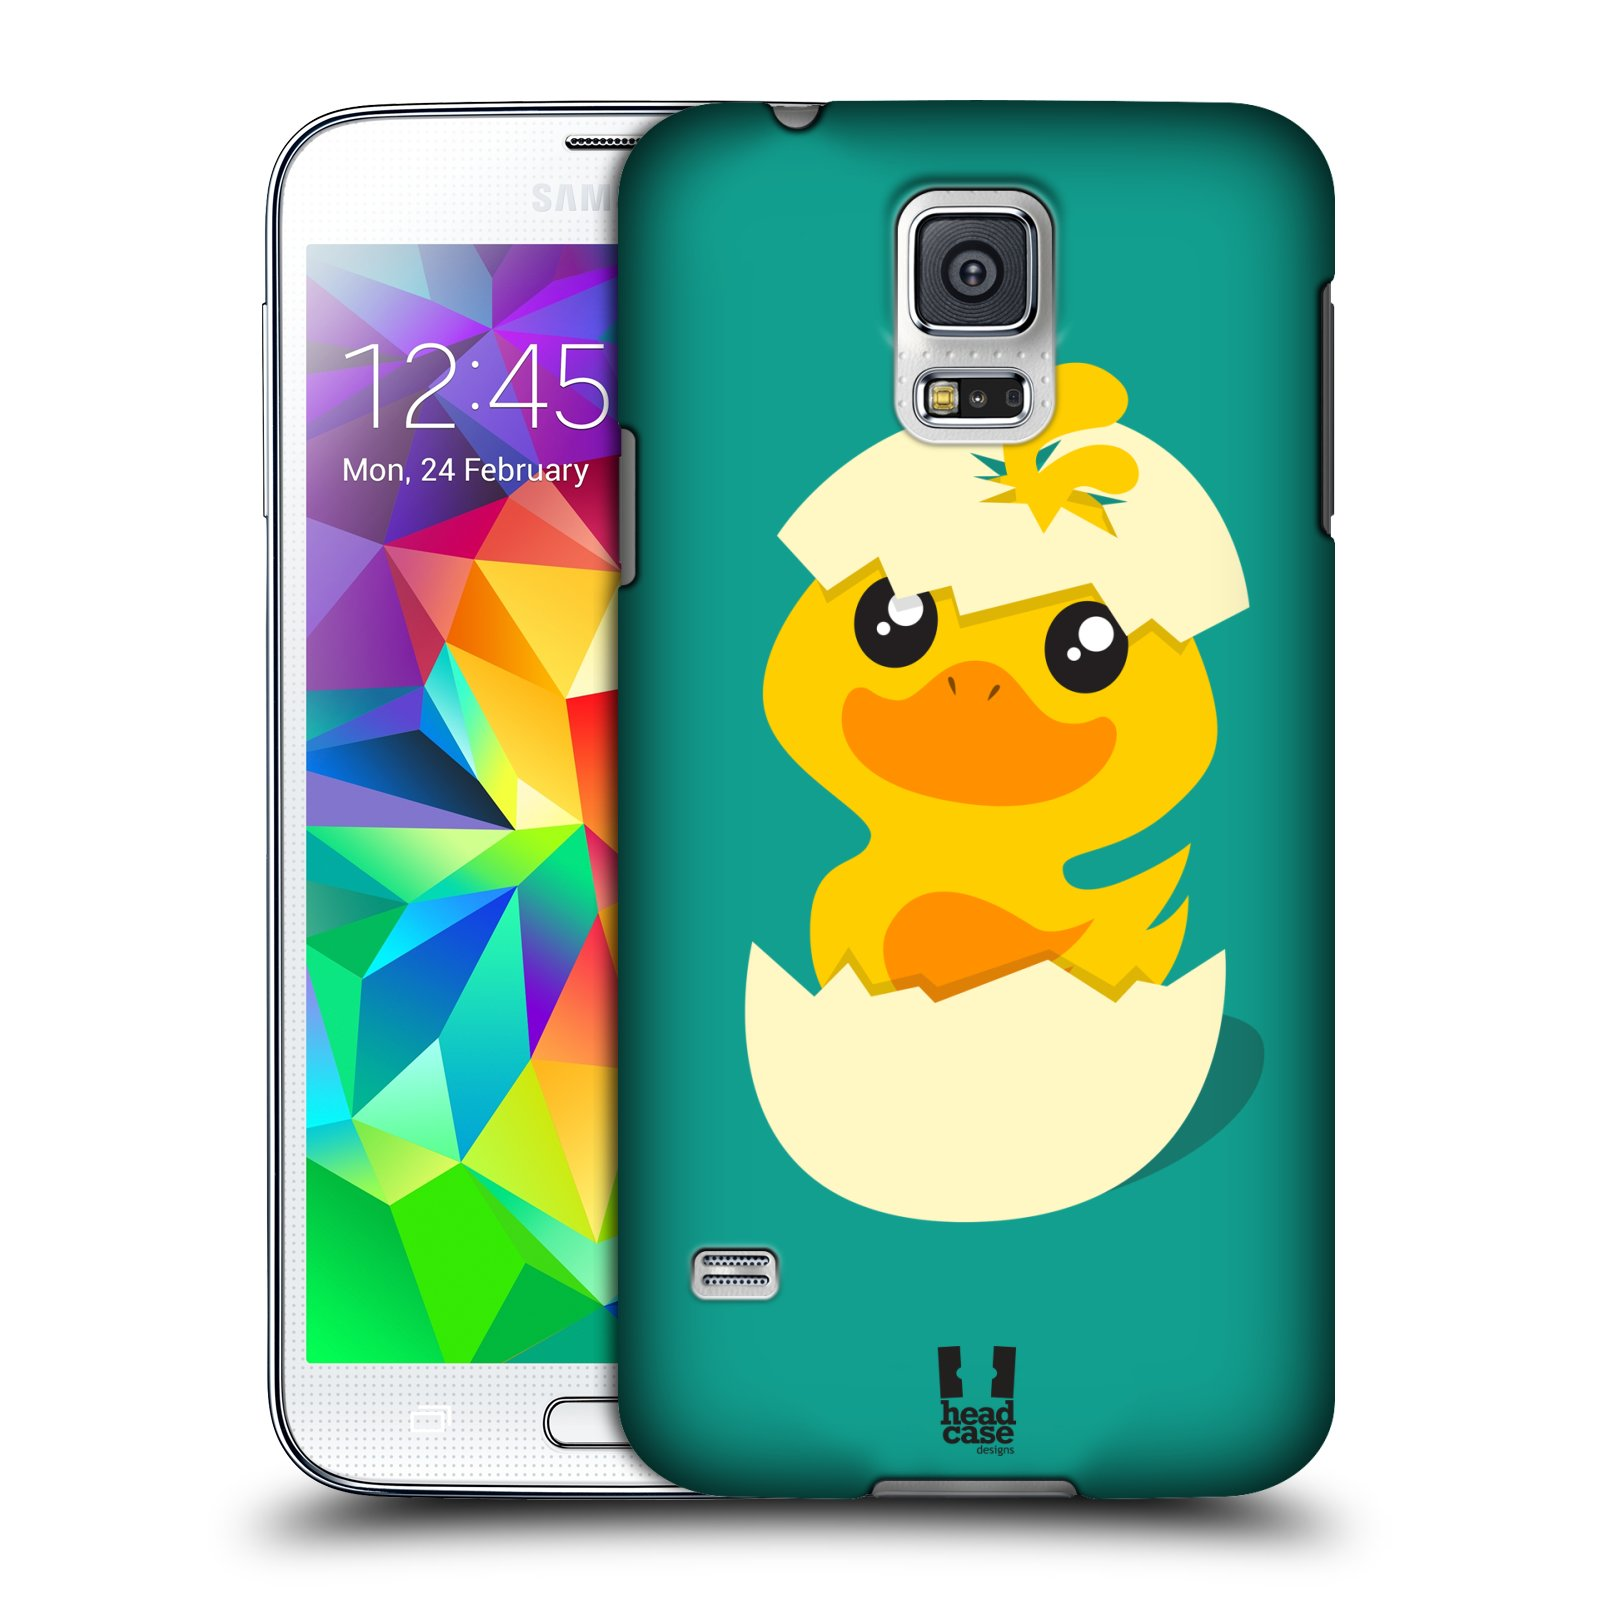 Plastové pouzdro na mobil Samsung Galaxy S5 HEAD CASE KACHNIČKA Z VAJÍČKA (Kryt či obal na mobilní telefon Samsung Galaxy S5 SM-G900F)